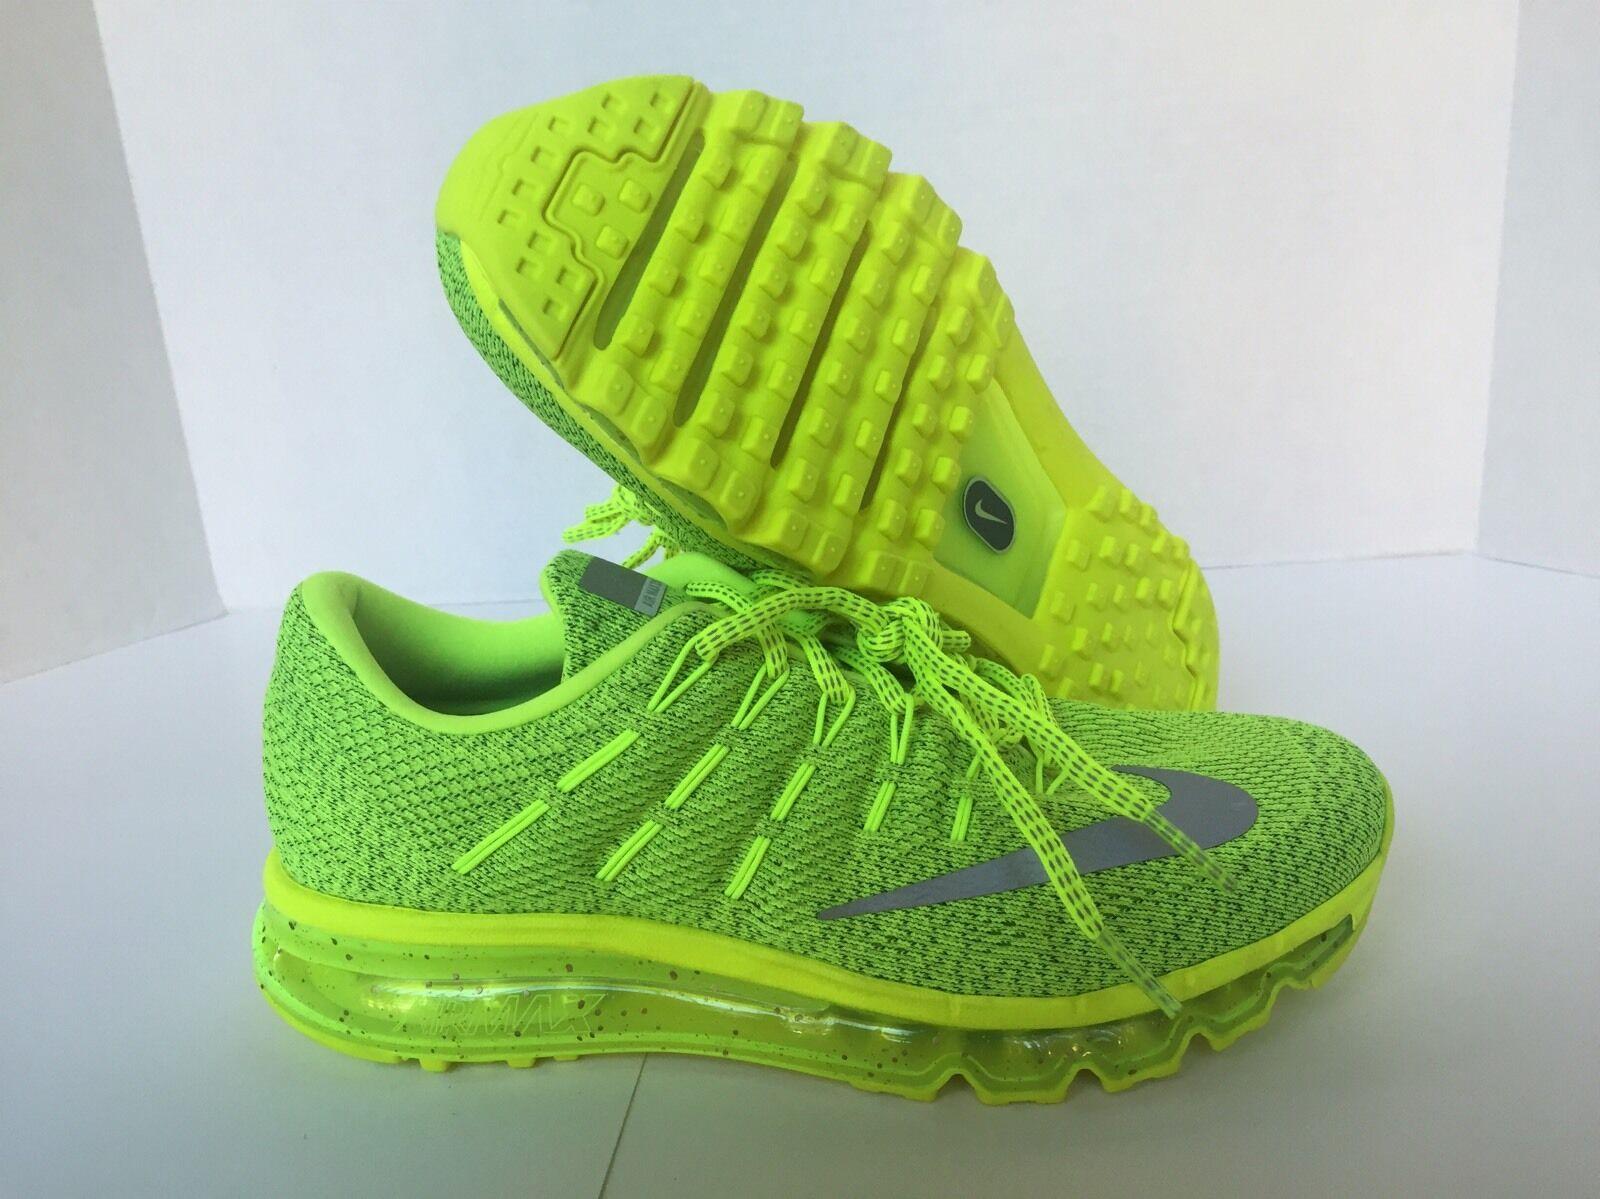 Nike Air Max iD Men's Multi-color NikeiD Running Shoe 839368 991 Sz 8